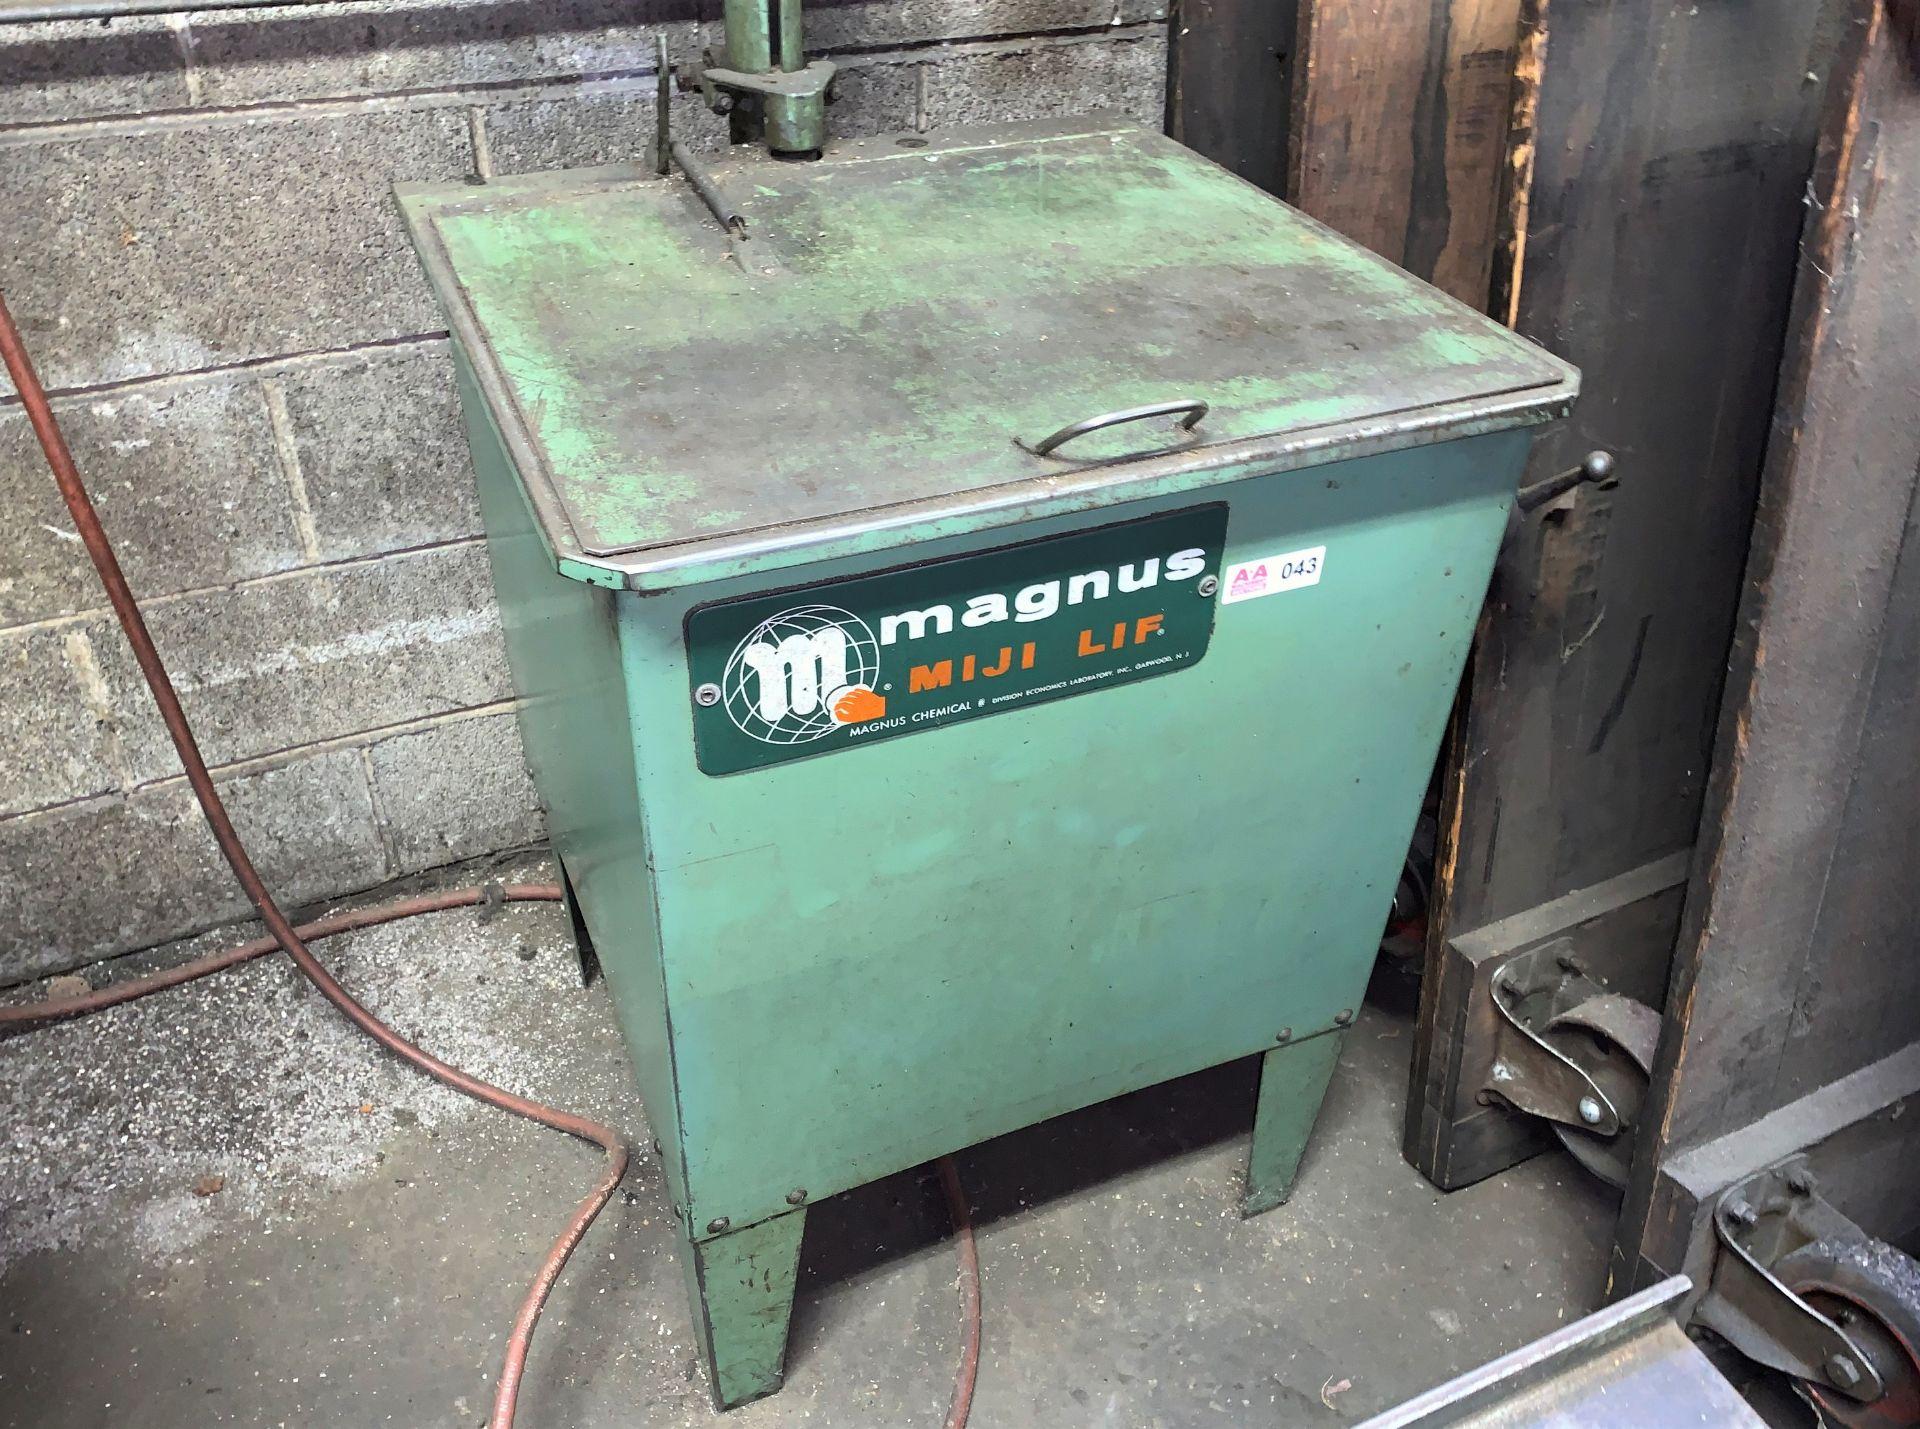 "Lot 43 - Magnus Miji Lift Parts Washer, Internal Chamber 22""W x 20""L x 16""Deep (Located in Levittown, PA"